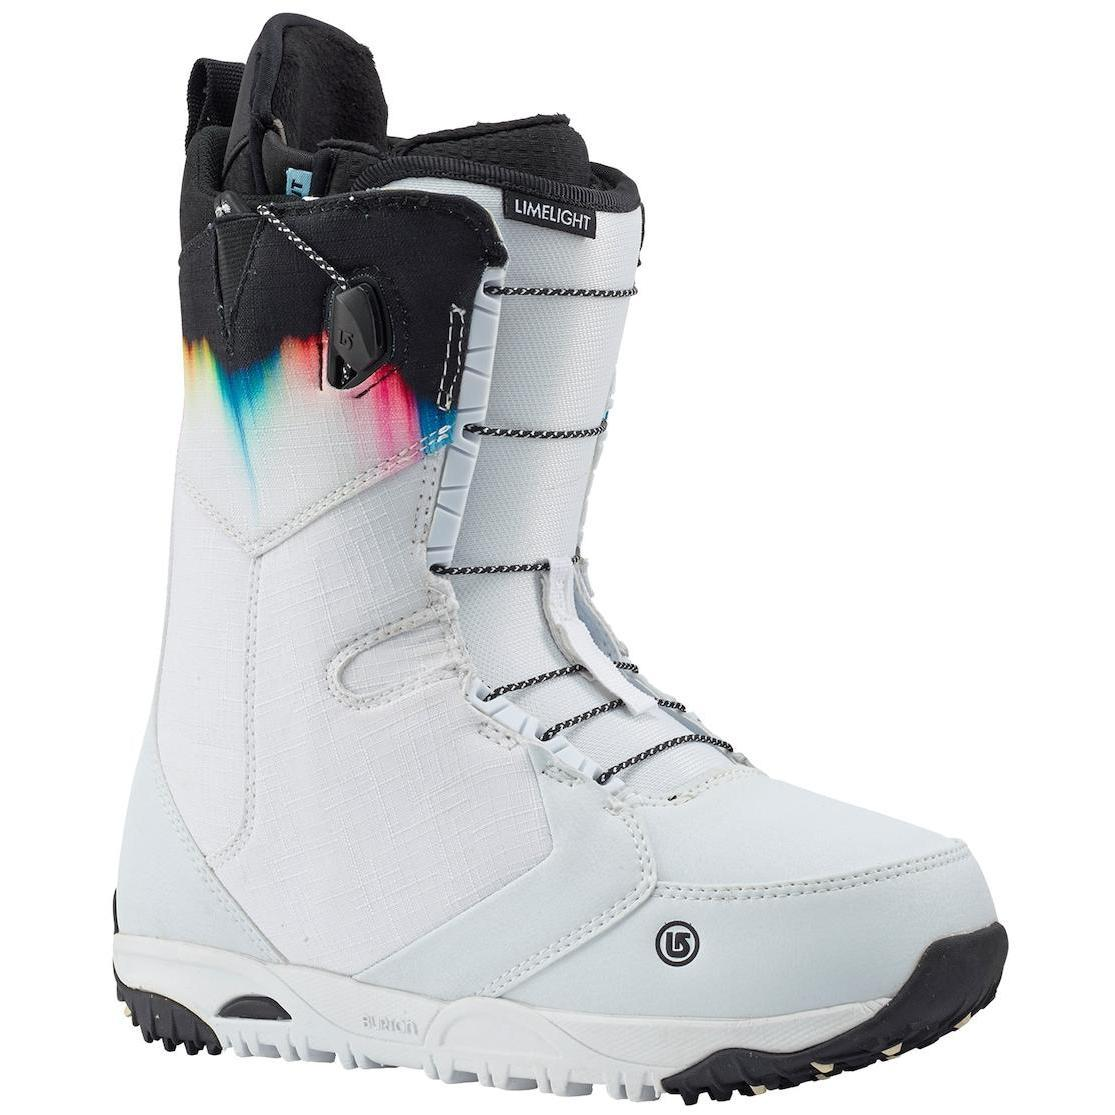 Ботинки для сноуборда BURTON 2017-18 LIMELIGHT WHITE SPECTRUM ... 7ea5f3d1394